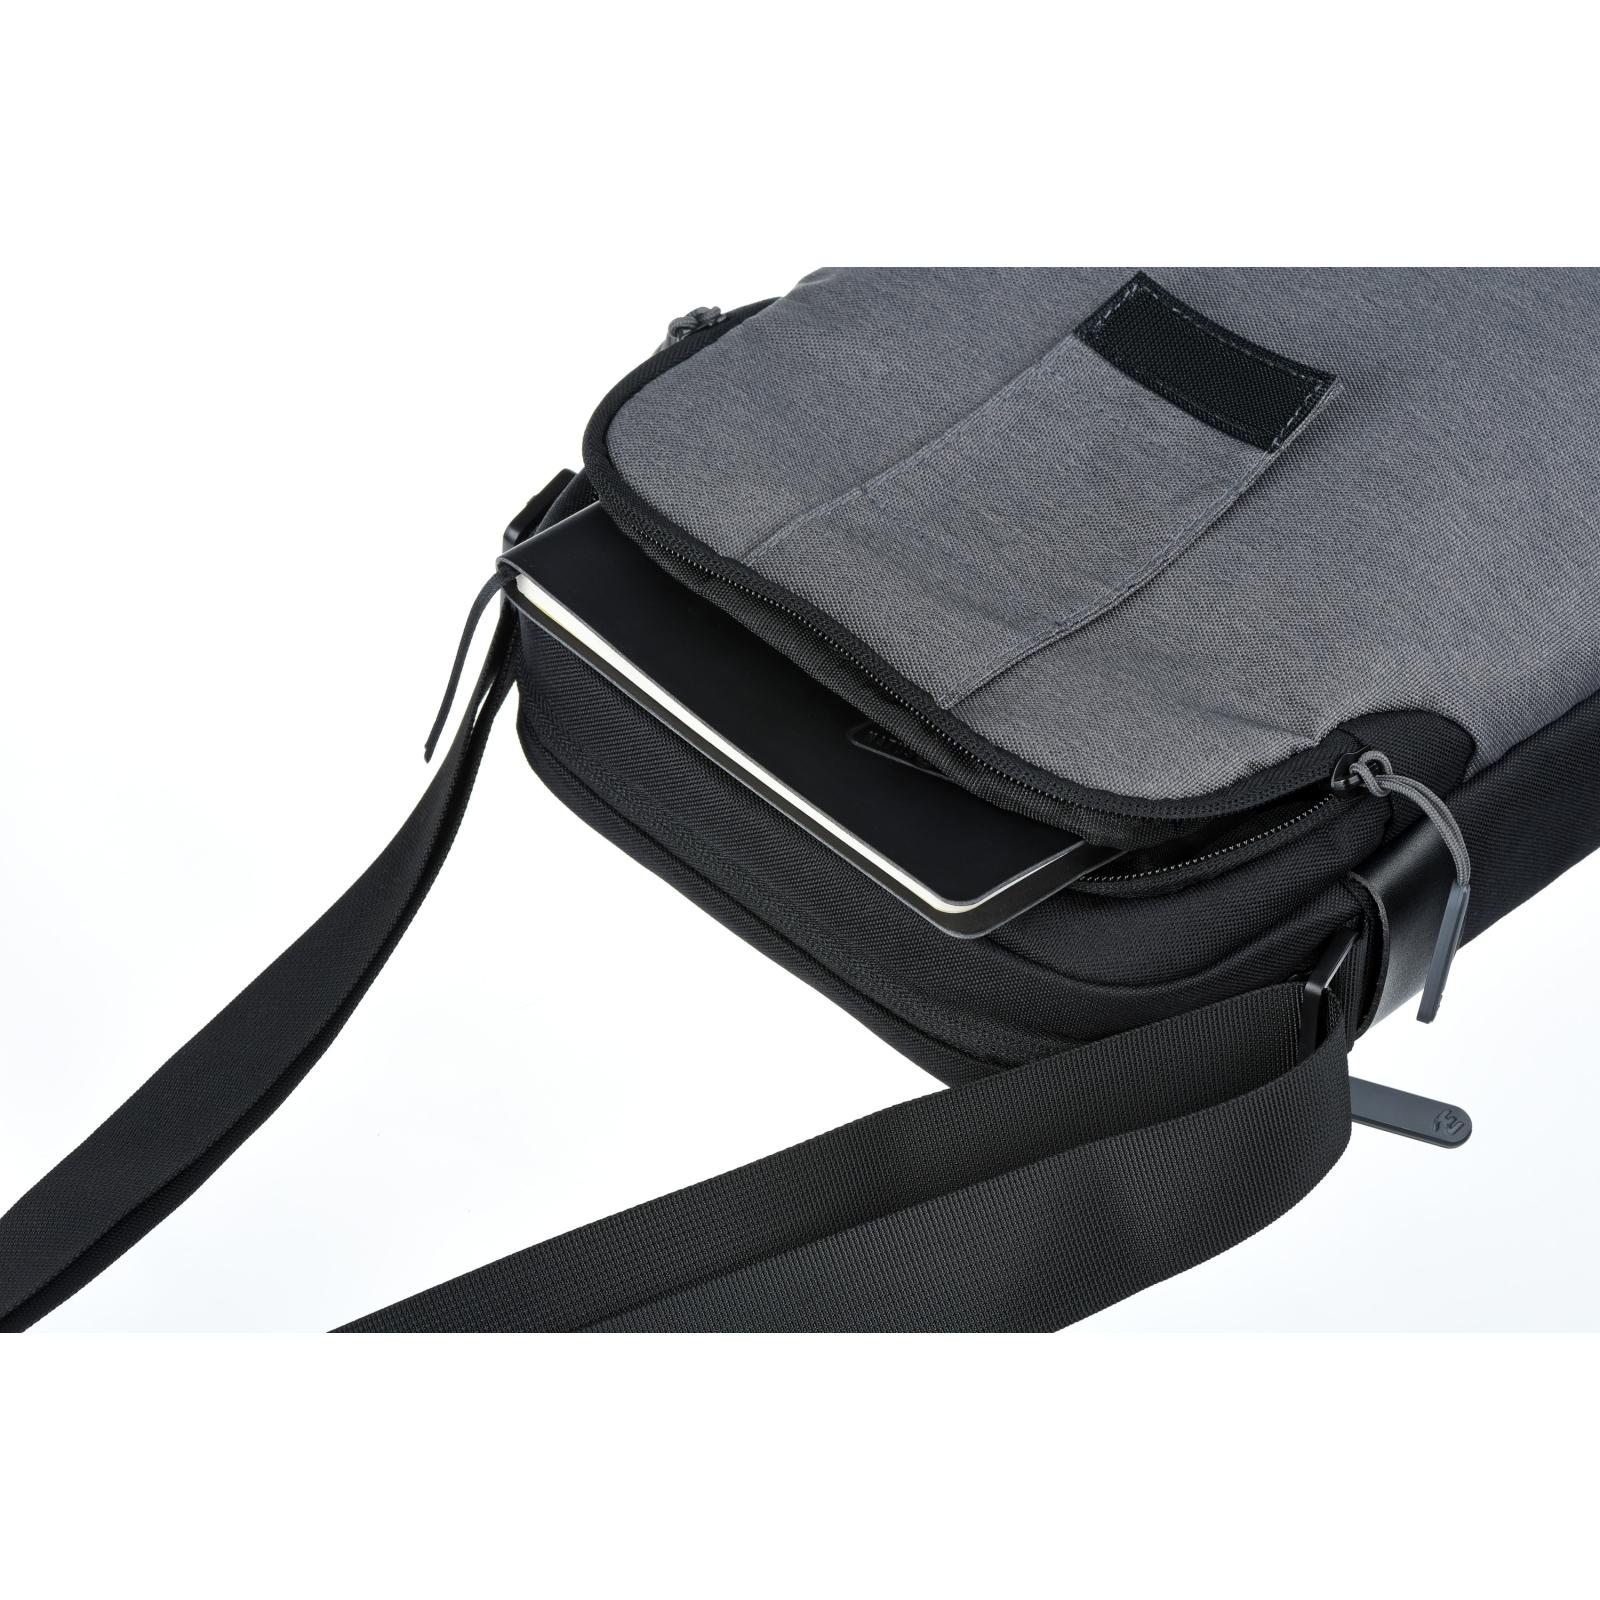 "Сумка для ноутбука 2E 10"" Supreme, Grey (2E-TBT9180BK) зображення 9"